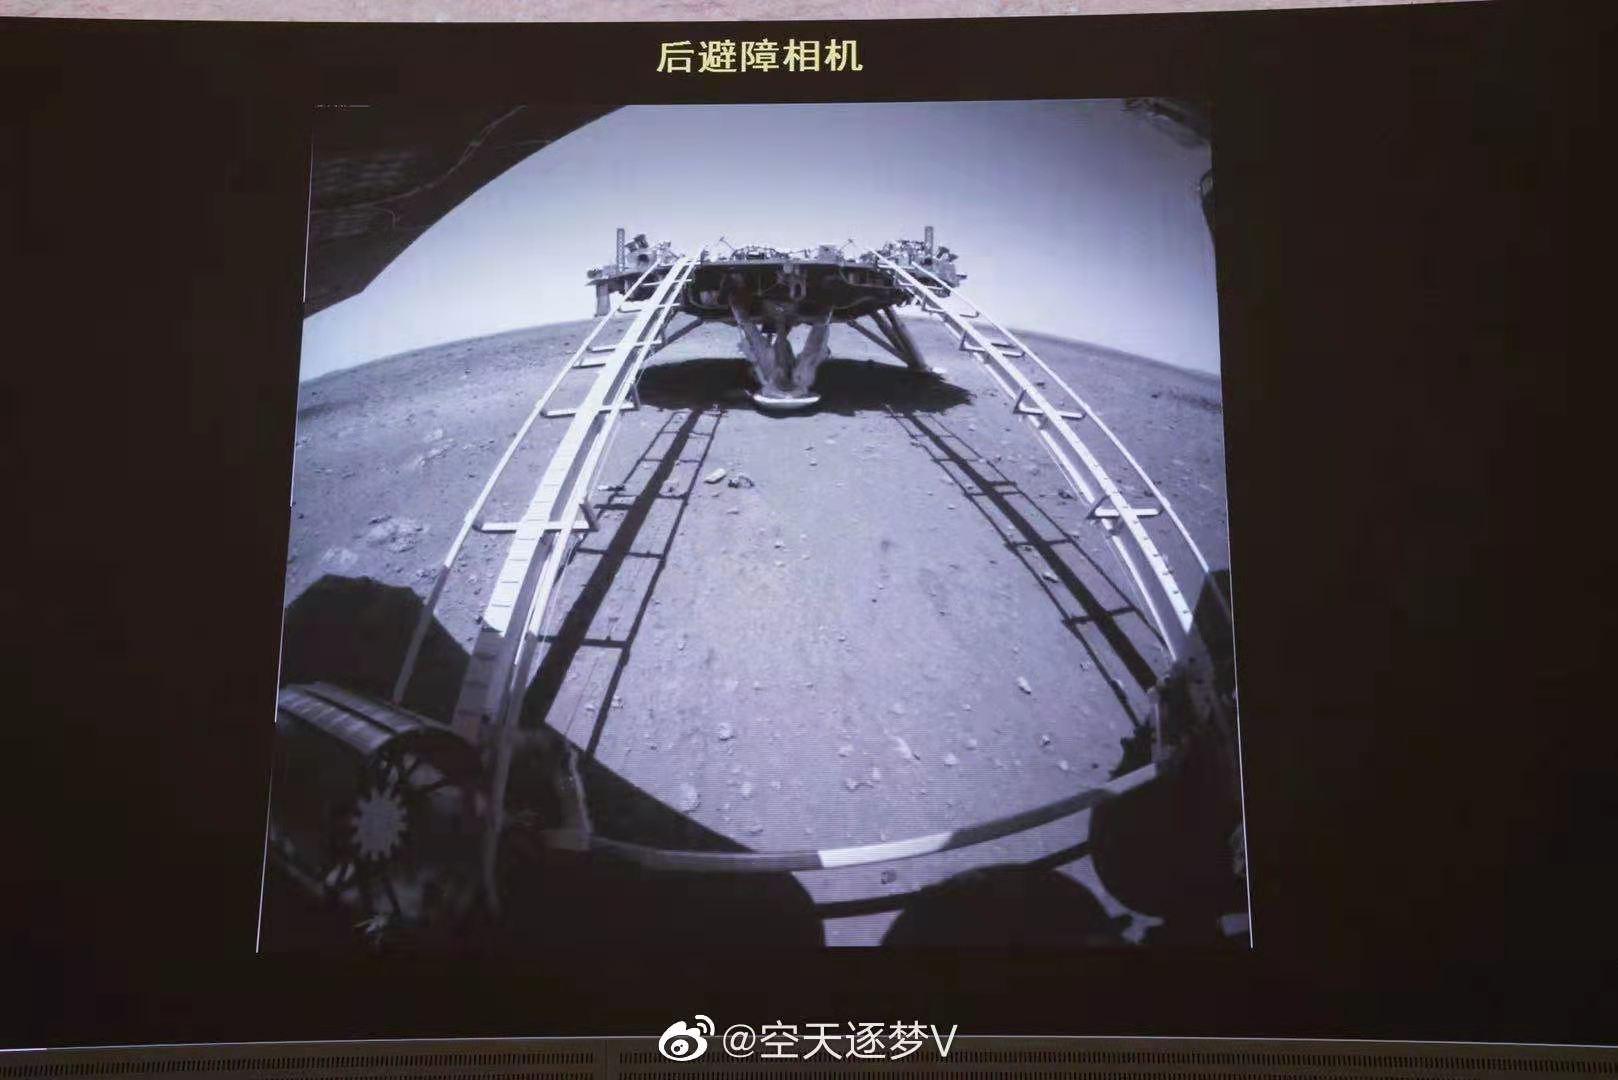 2021-zhurong-rolls.jpg